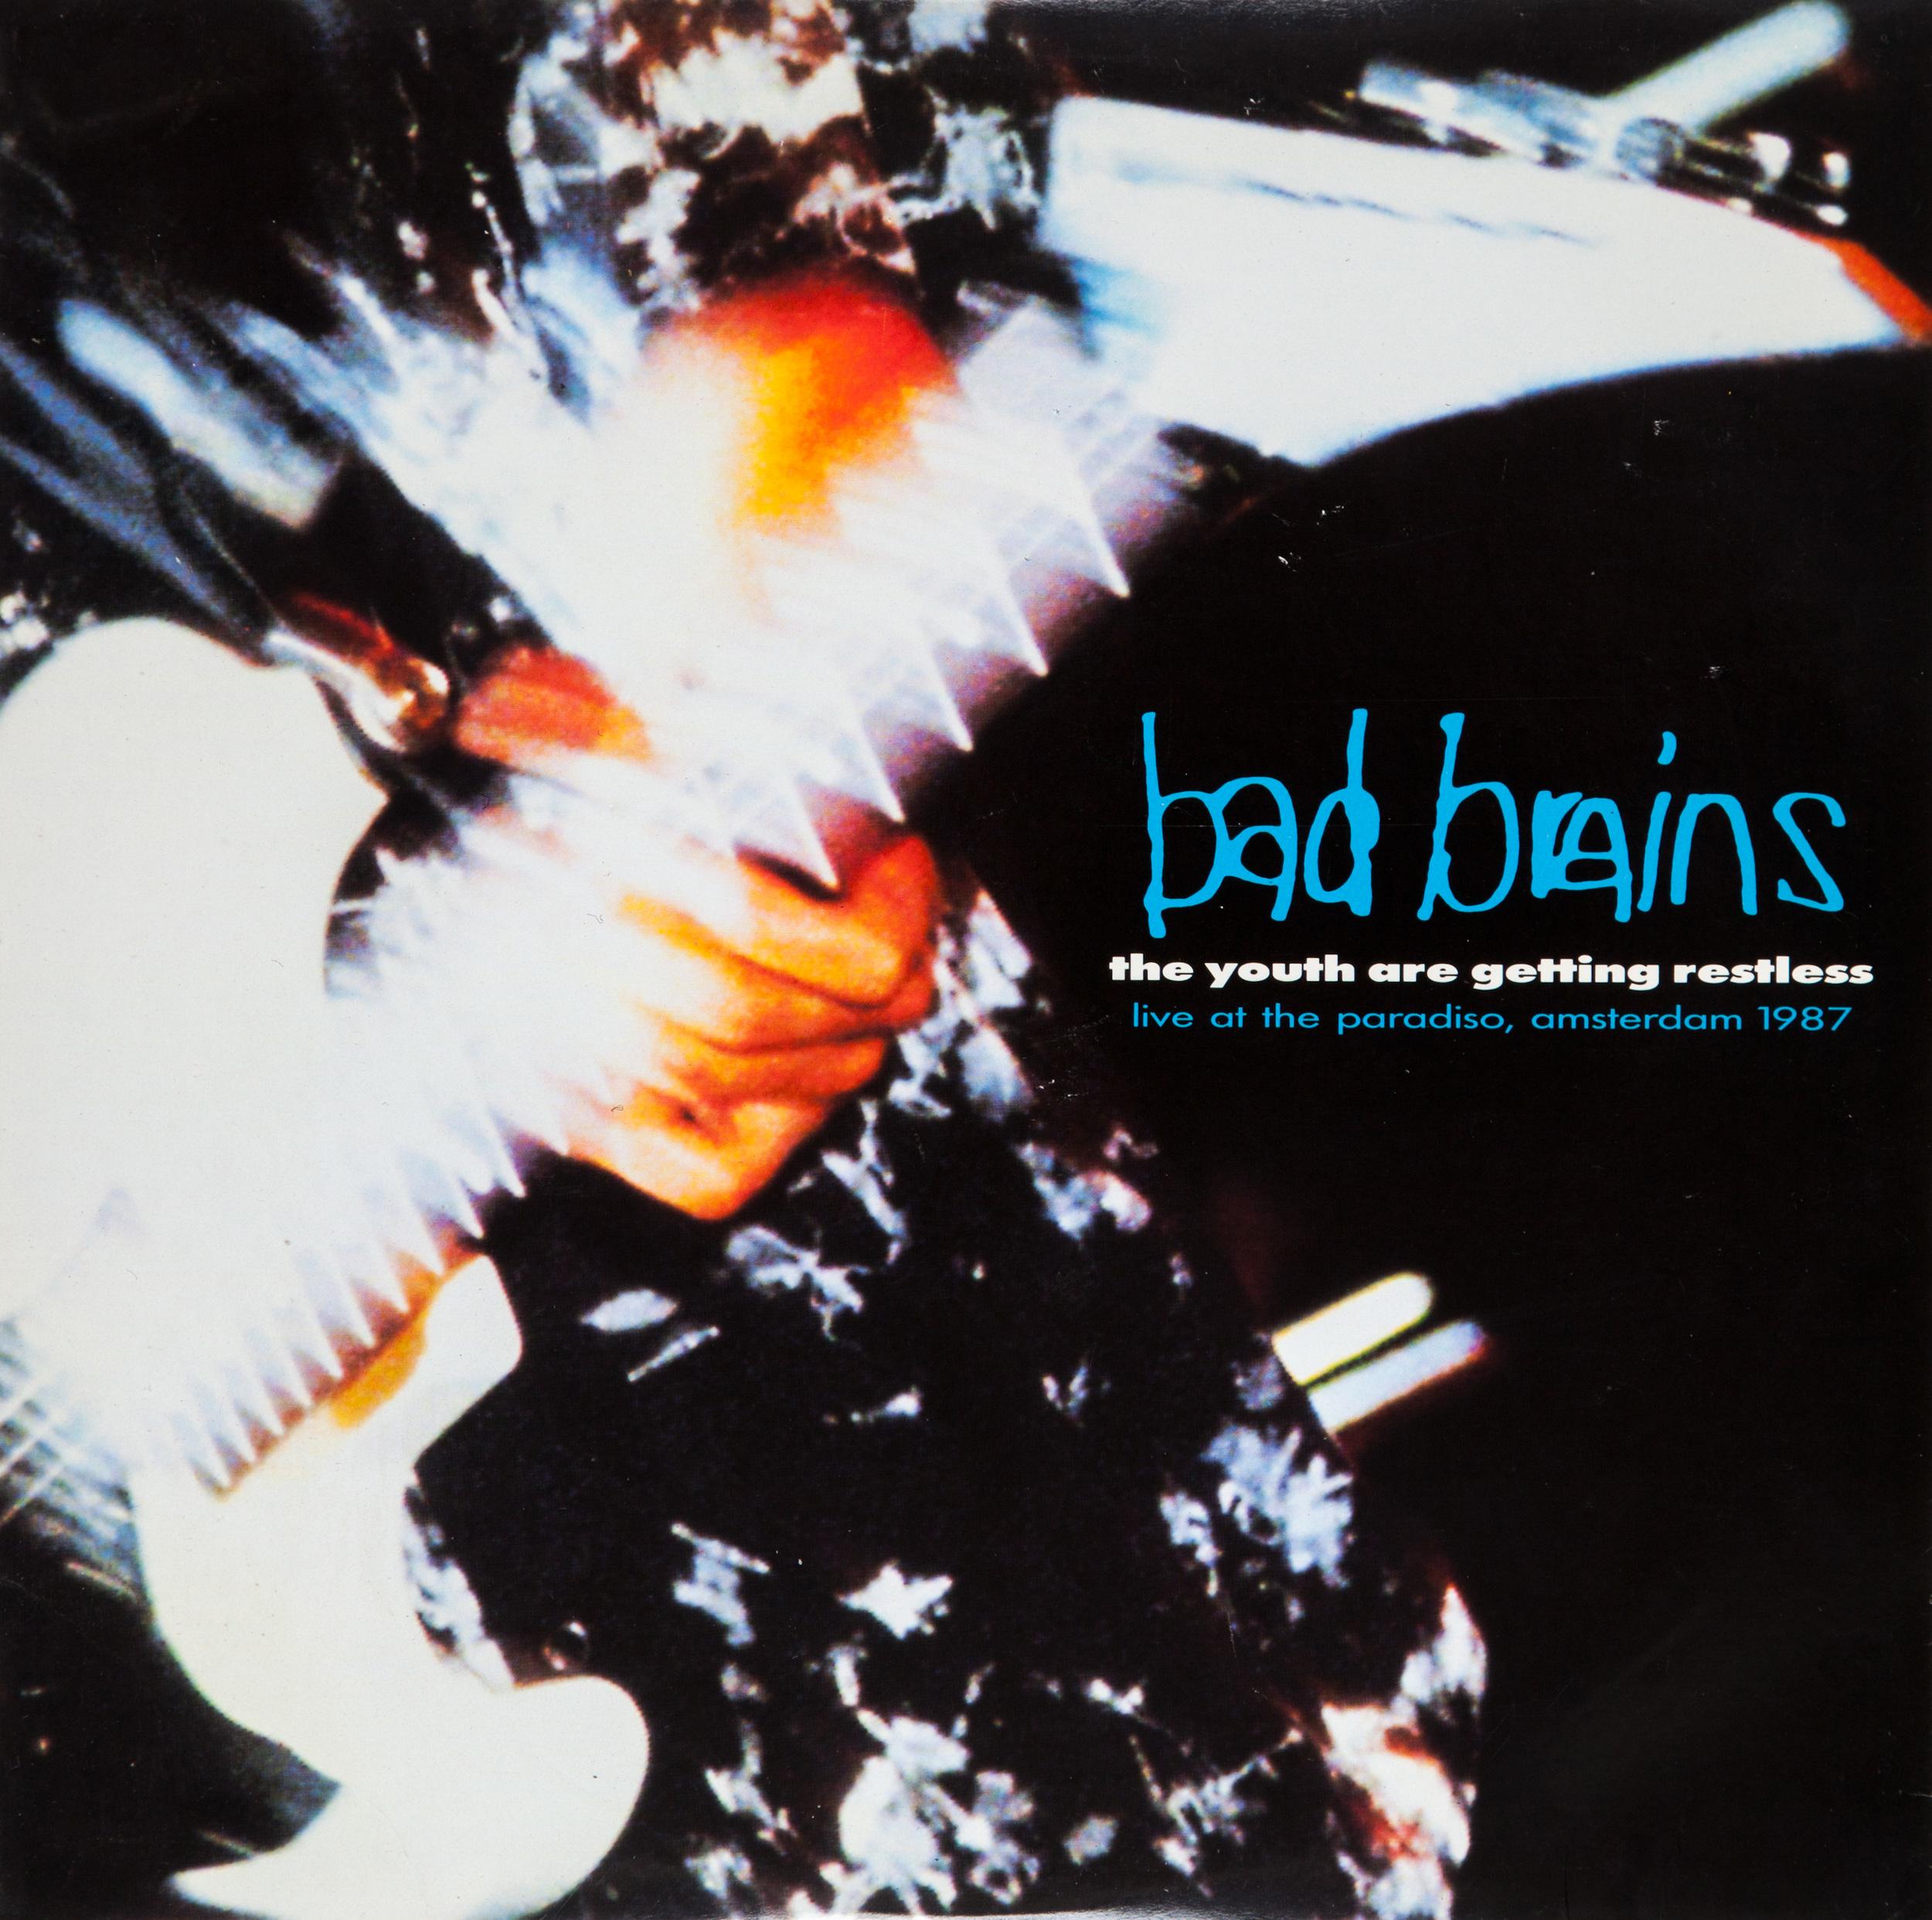 2015-0330-BJPapas_AlbumCovers_BadBrains-TheYouthAreGettingRestless_Front&Back0009.jpg